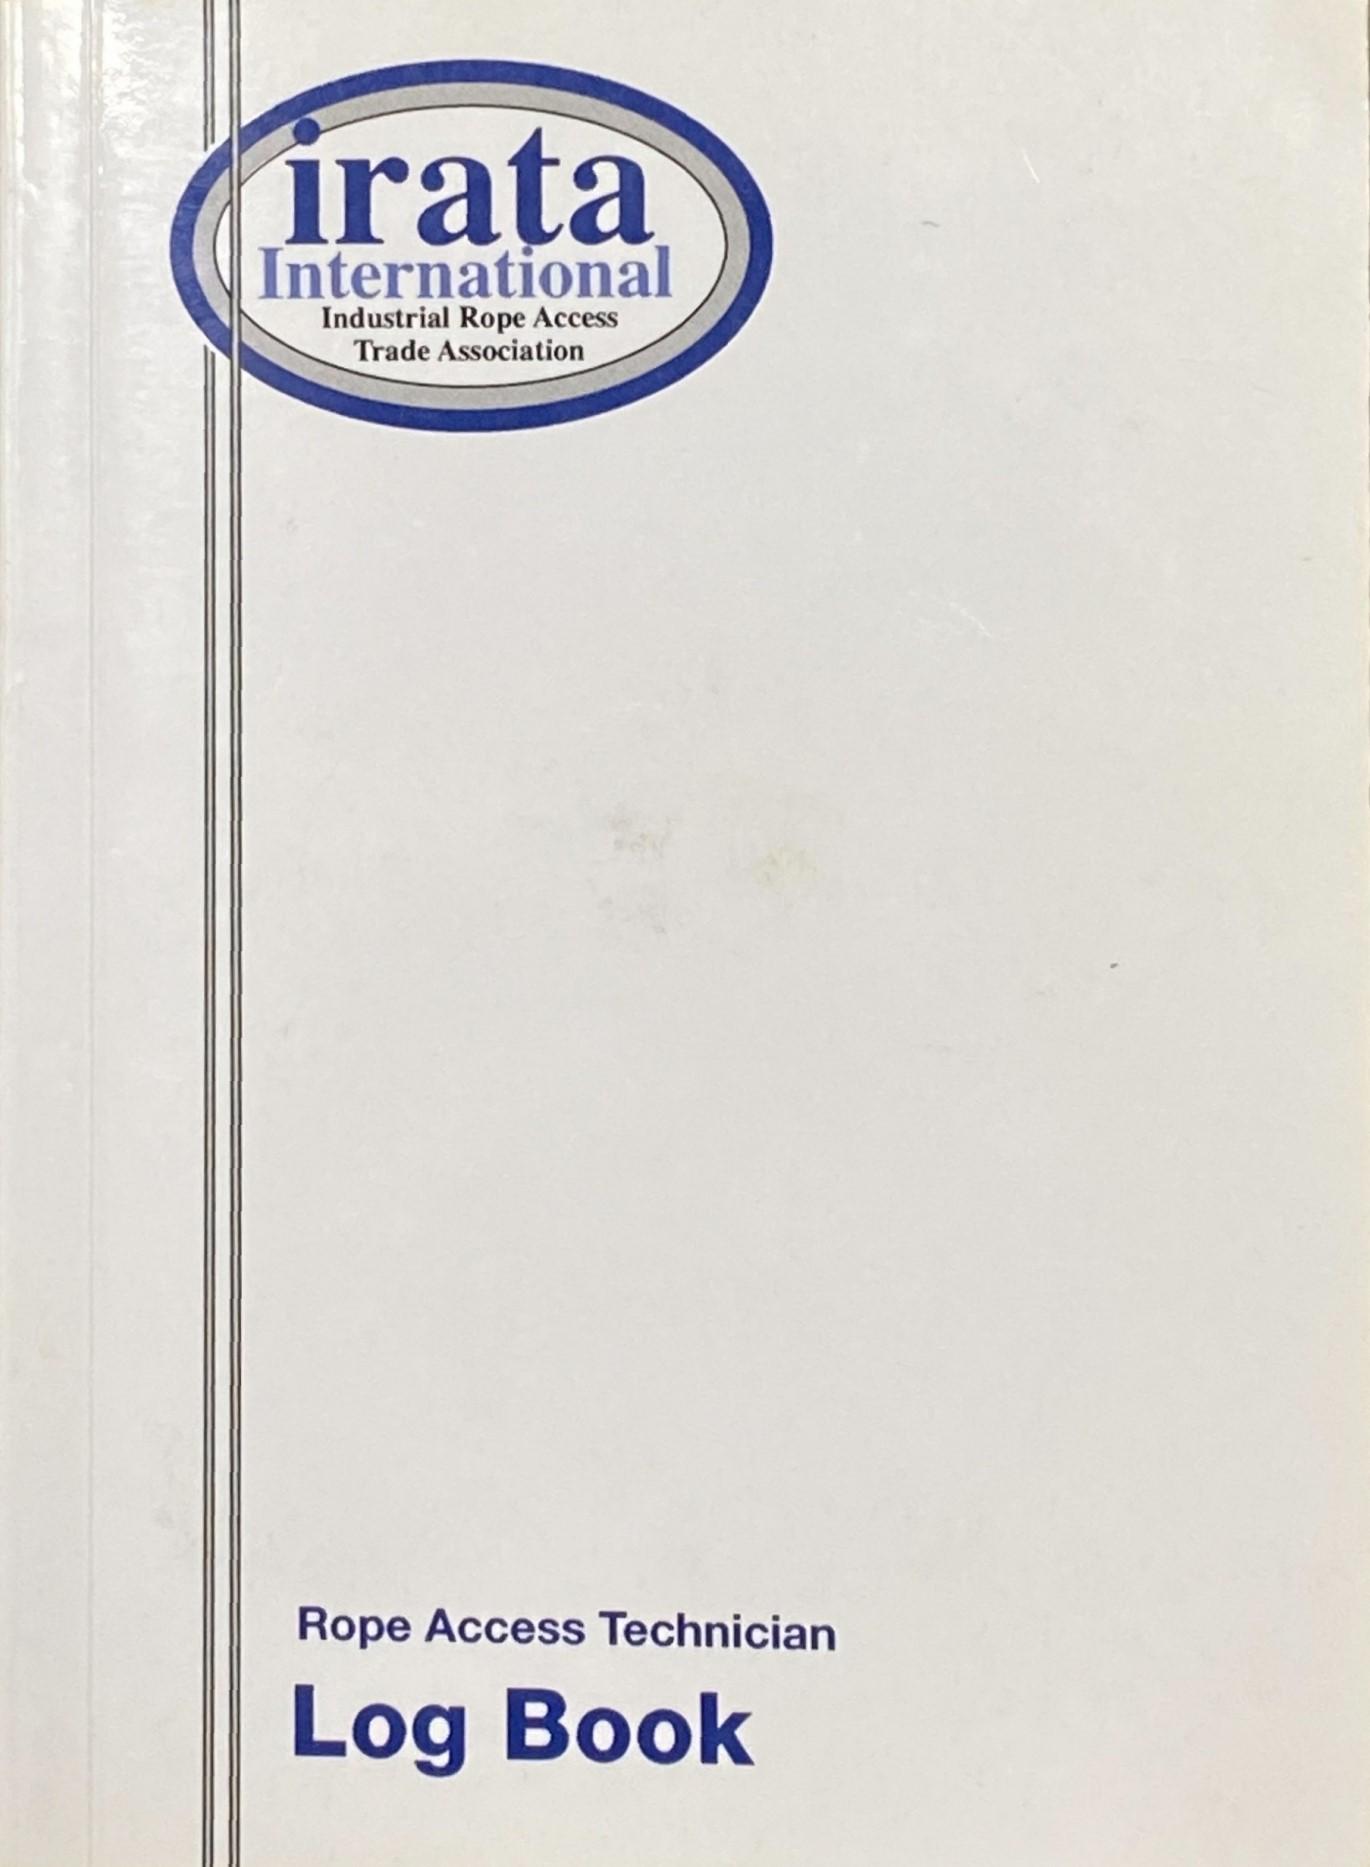 irata logbook